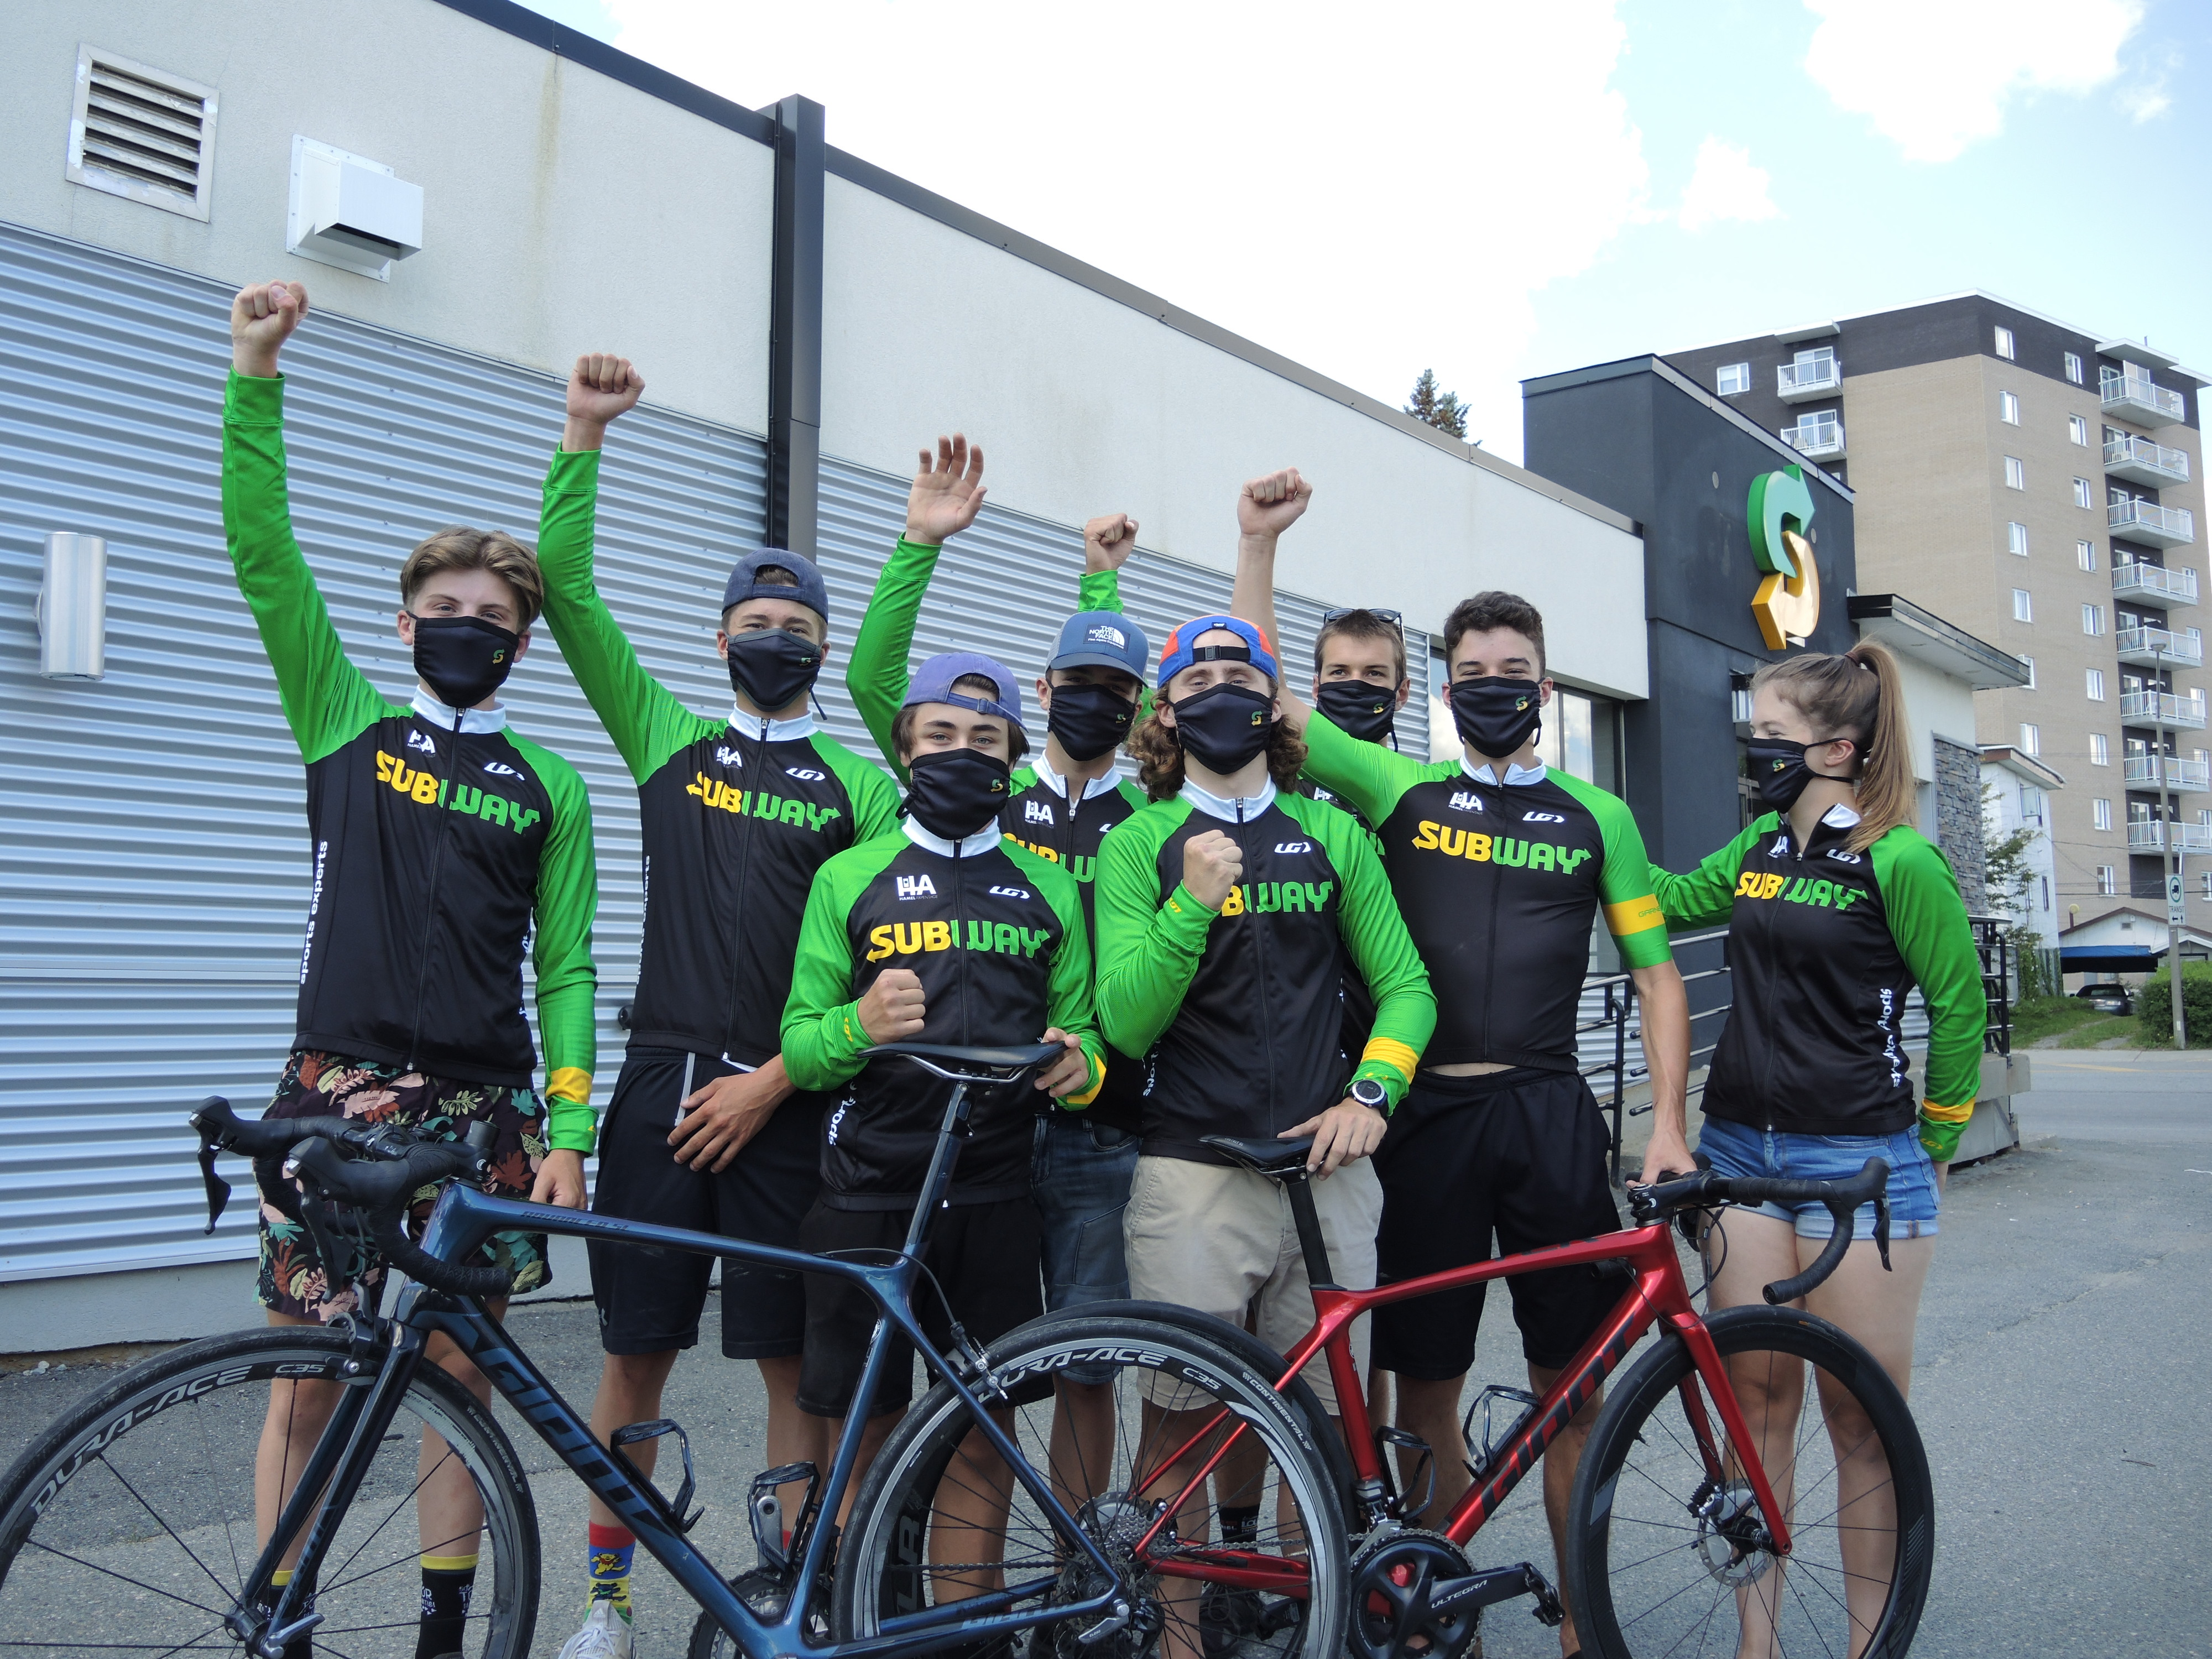 Équipe cycliste juinior Subway Abitibi Rouyn-Noranda